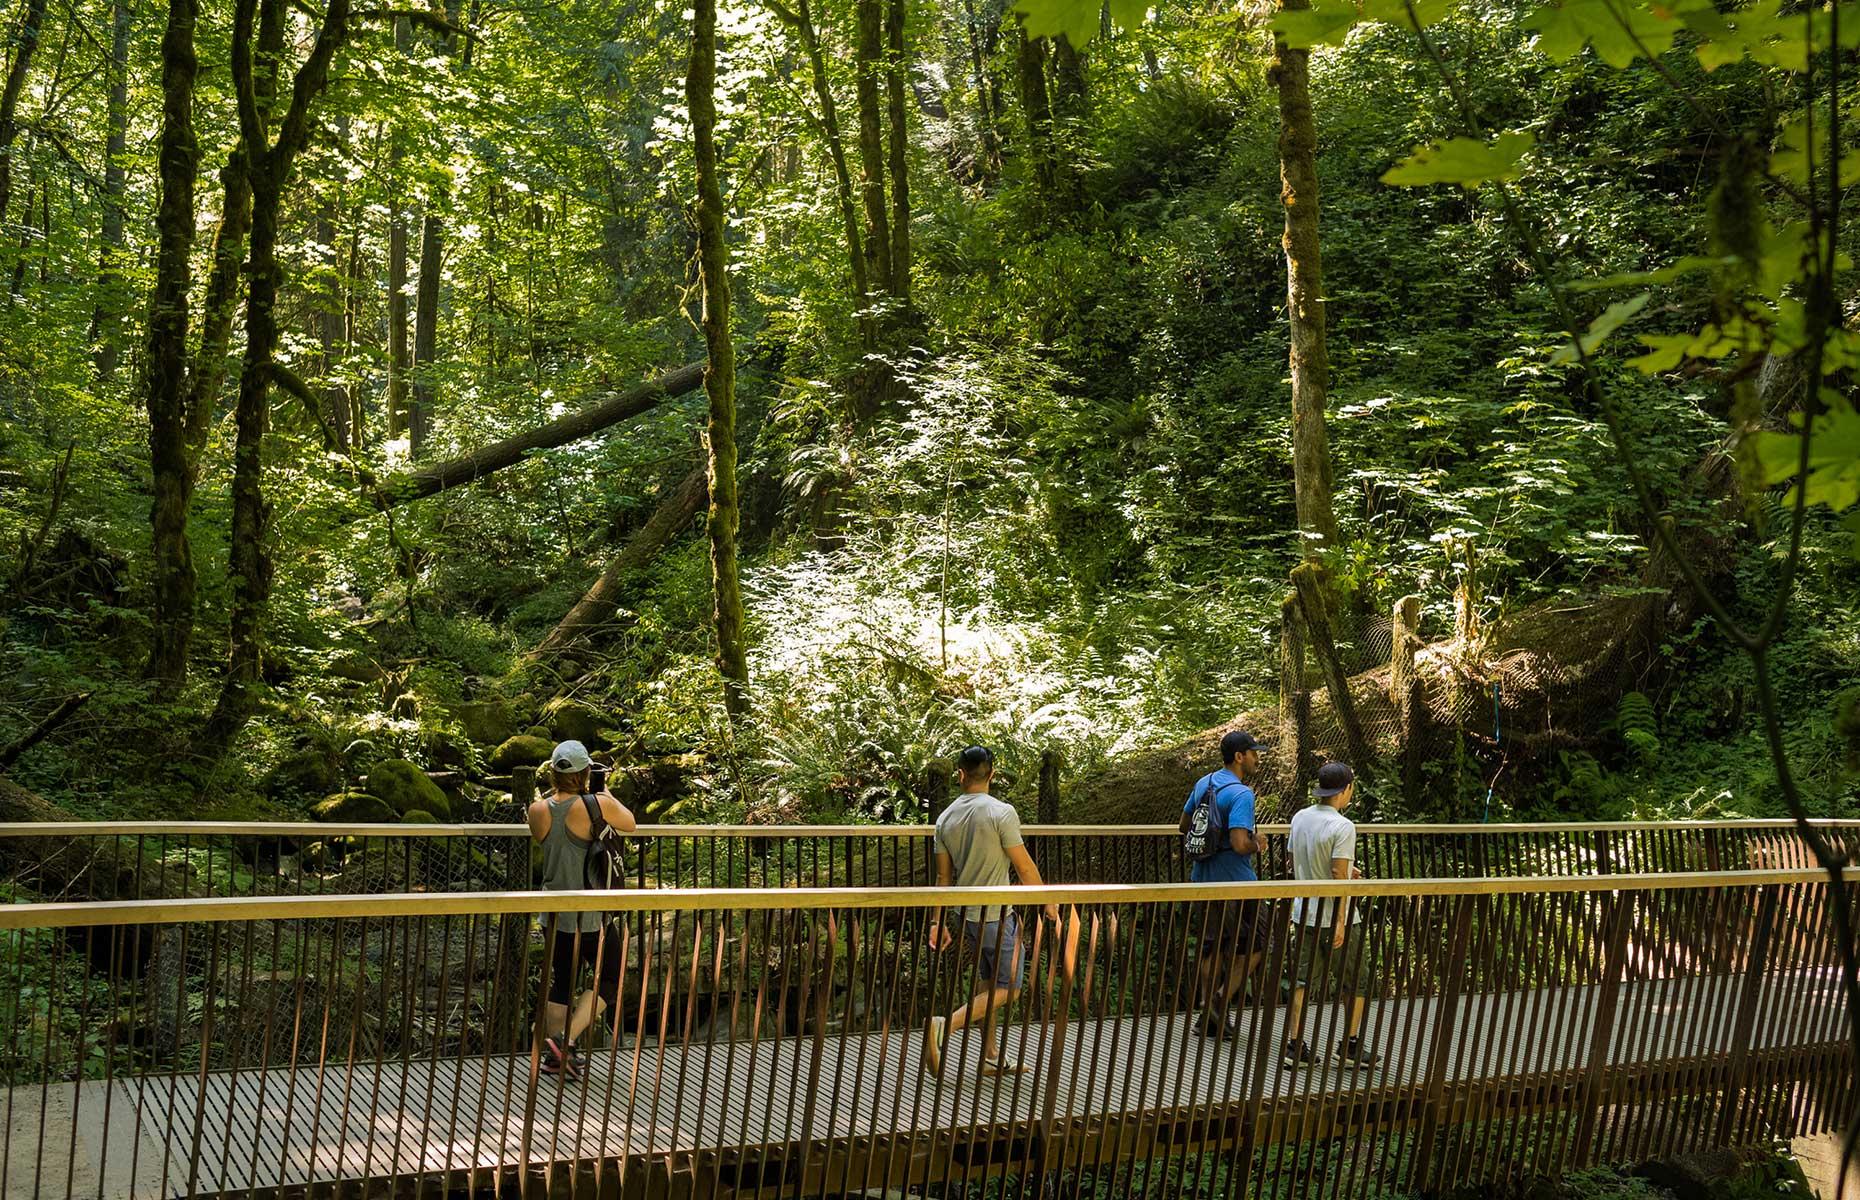 Forest Park hiking trails, Portland, Oregon (Image: Justin Katigbak/Travel Portland)